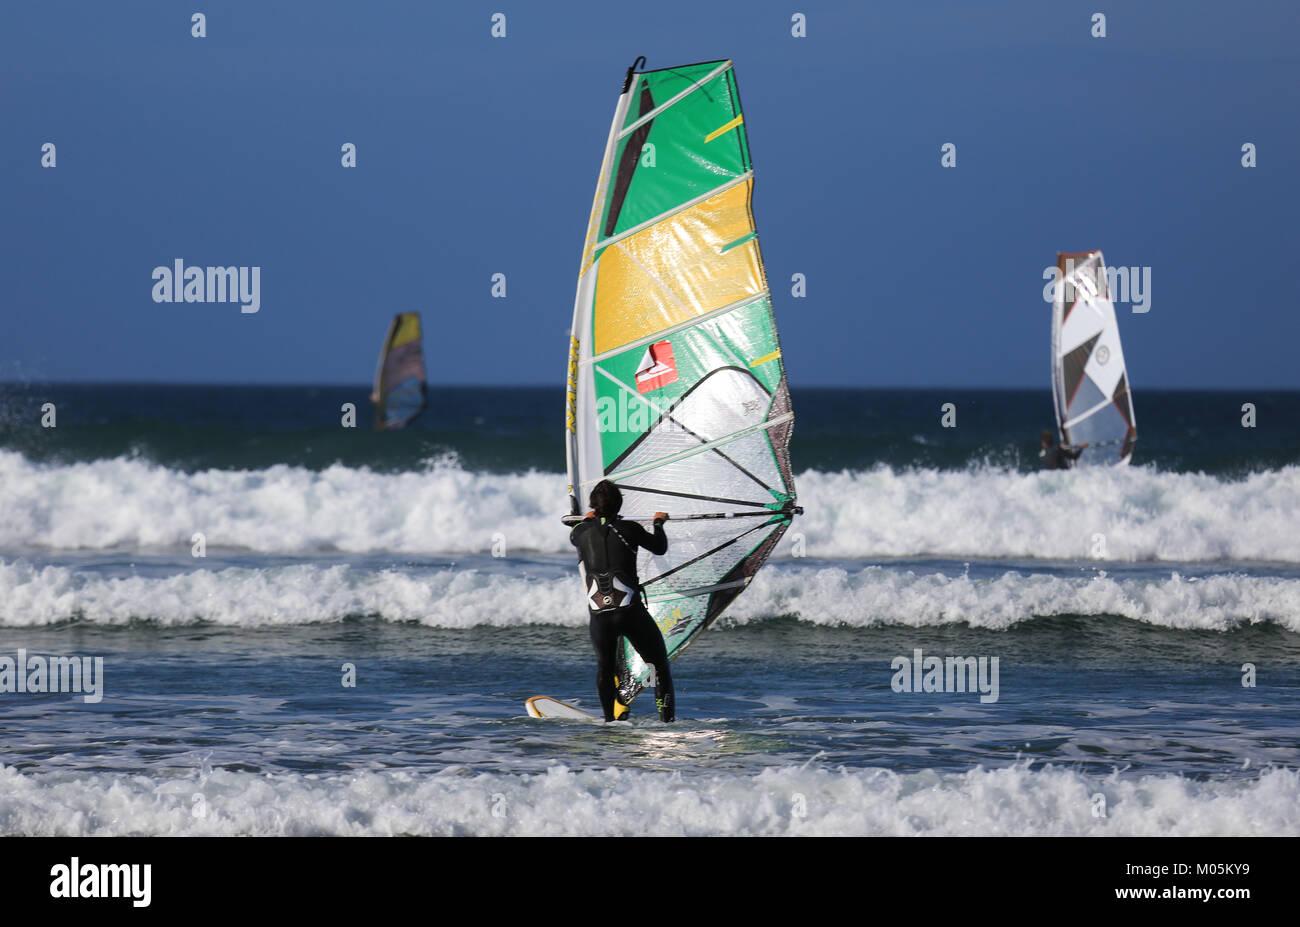 Windsurfing at Inch beach, Dingle Peninsula, co. kerry - Stock Image